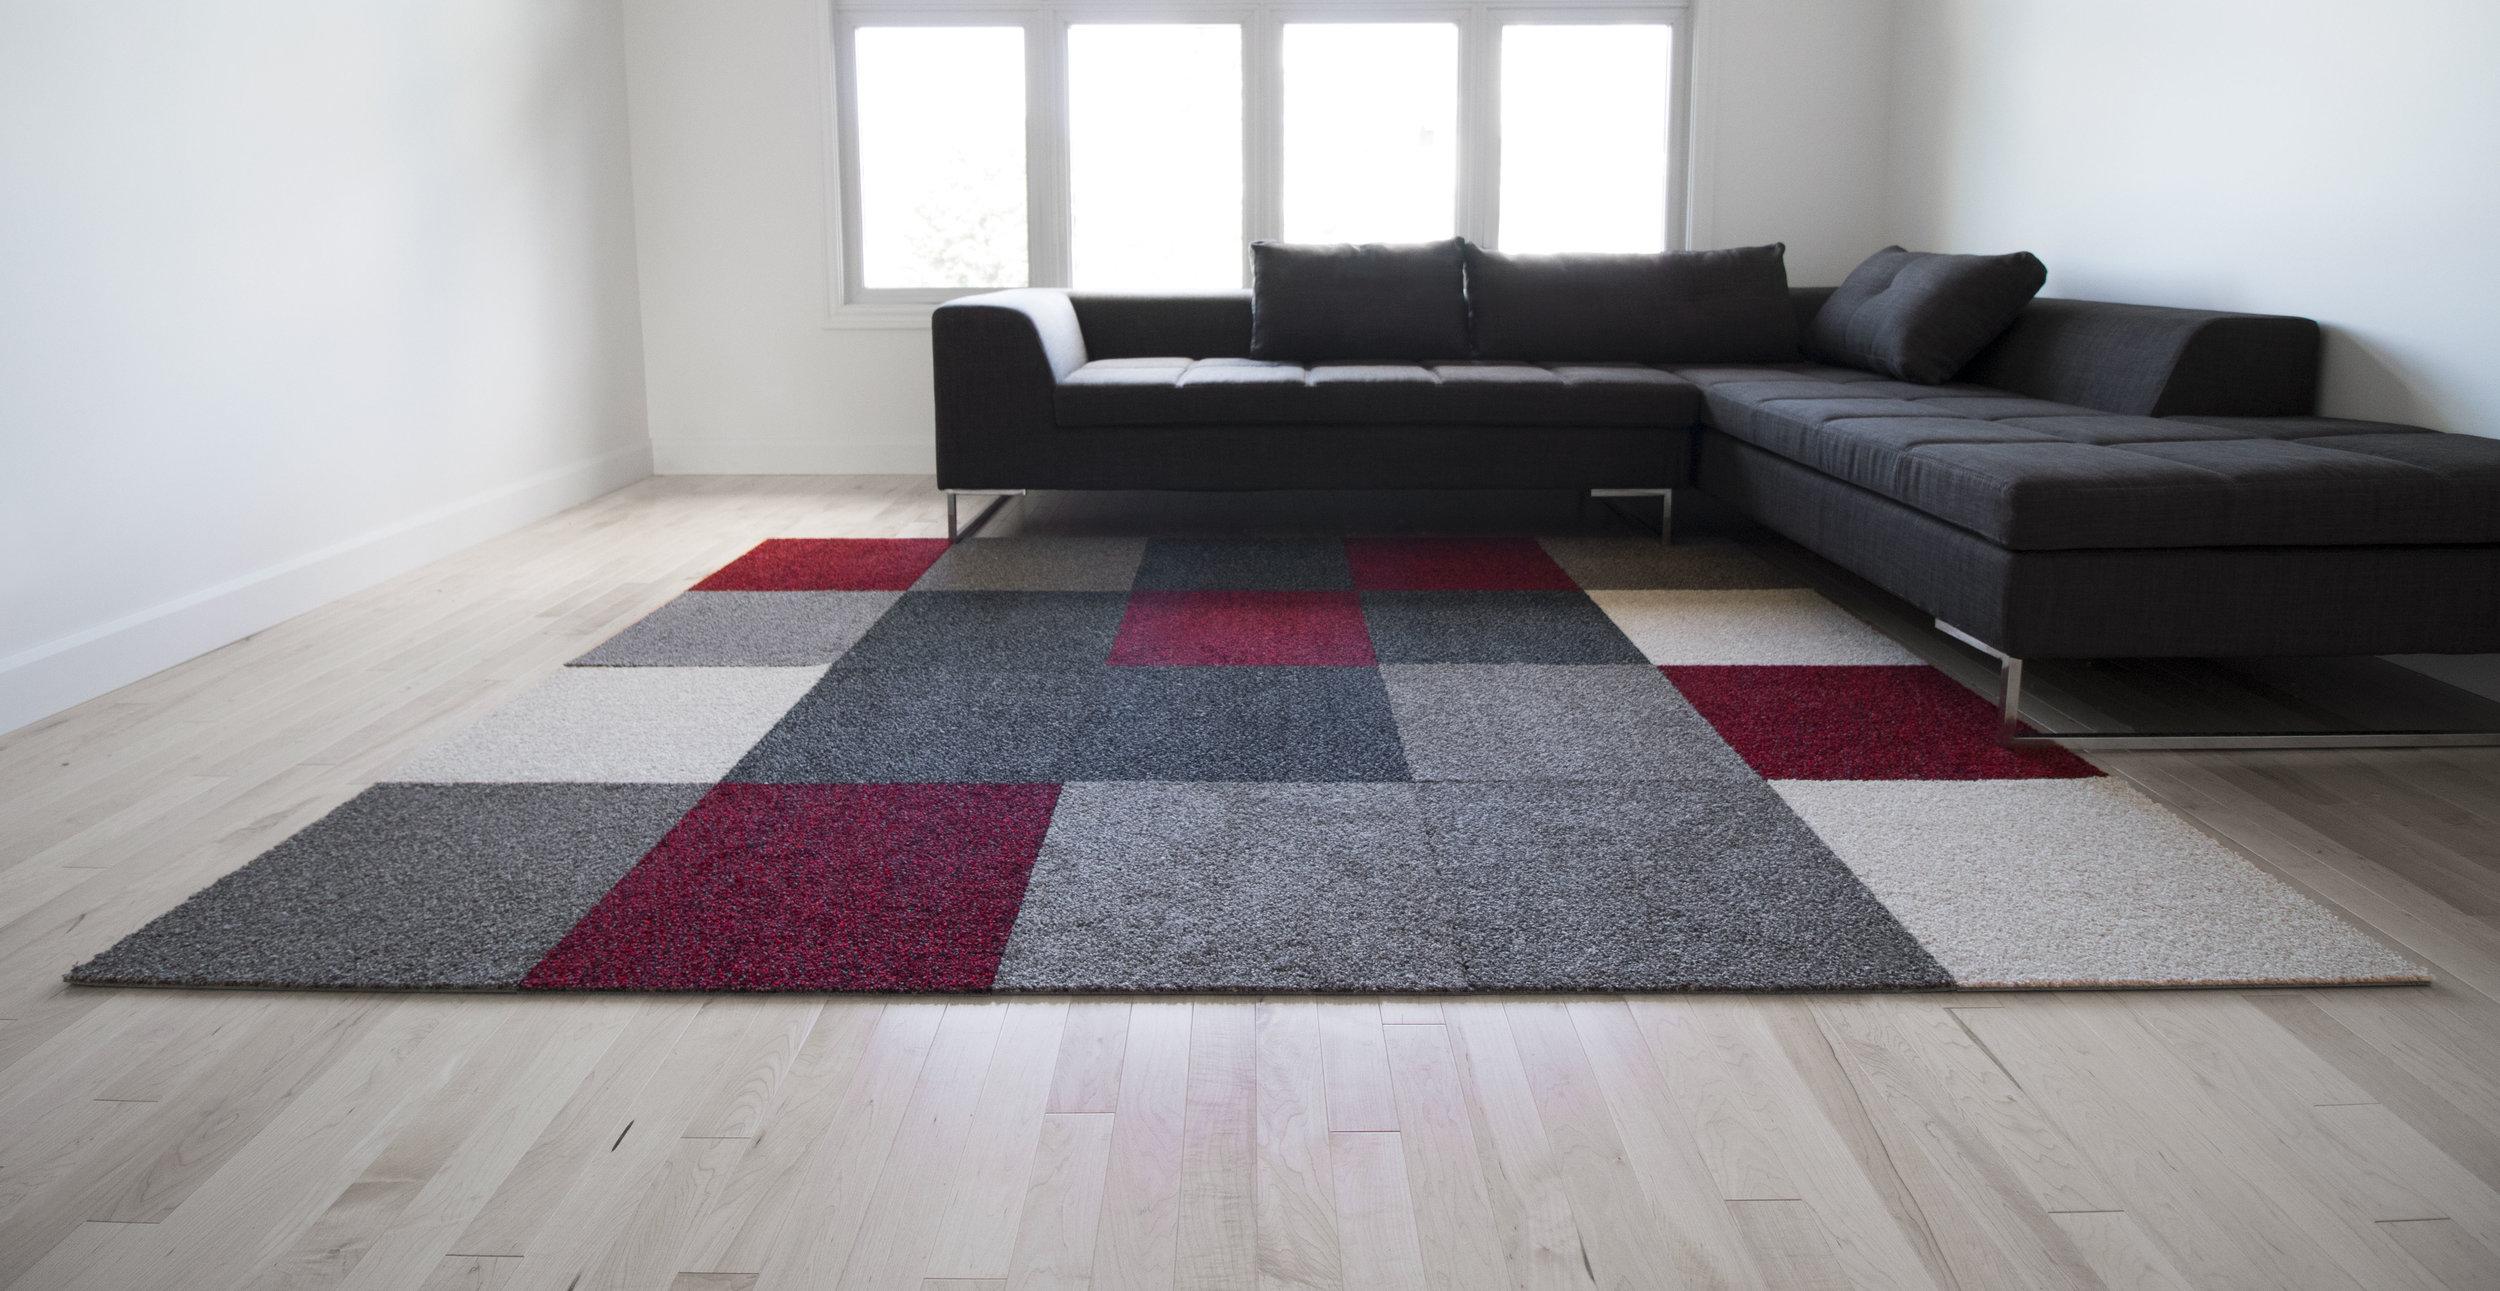 Harmony carpet tile — Rug installation